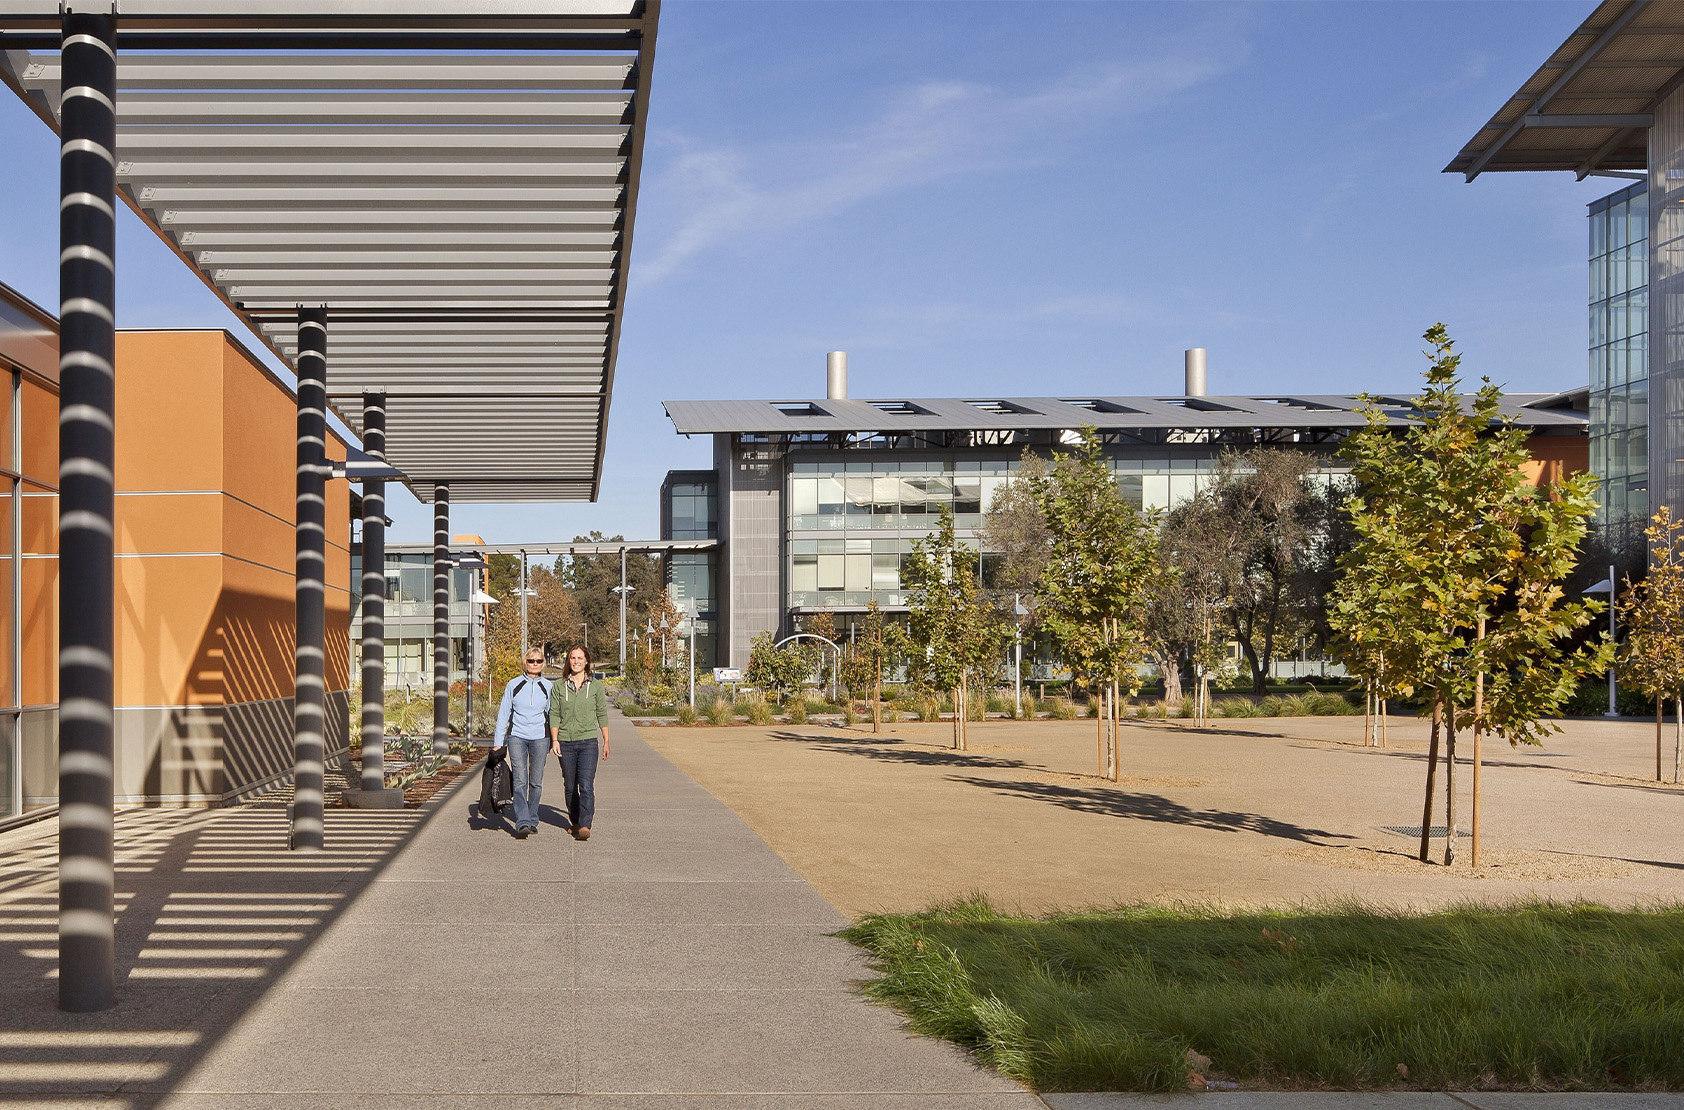 University of California - Wine, Beer and Food Laboratory